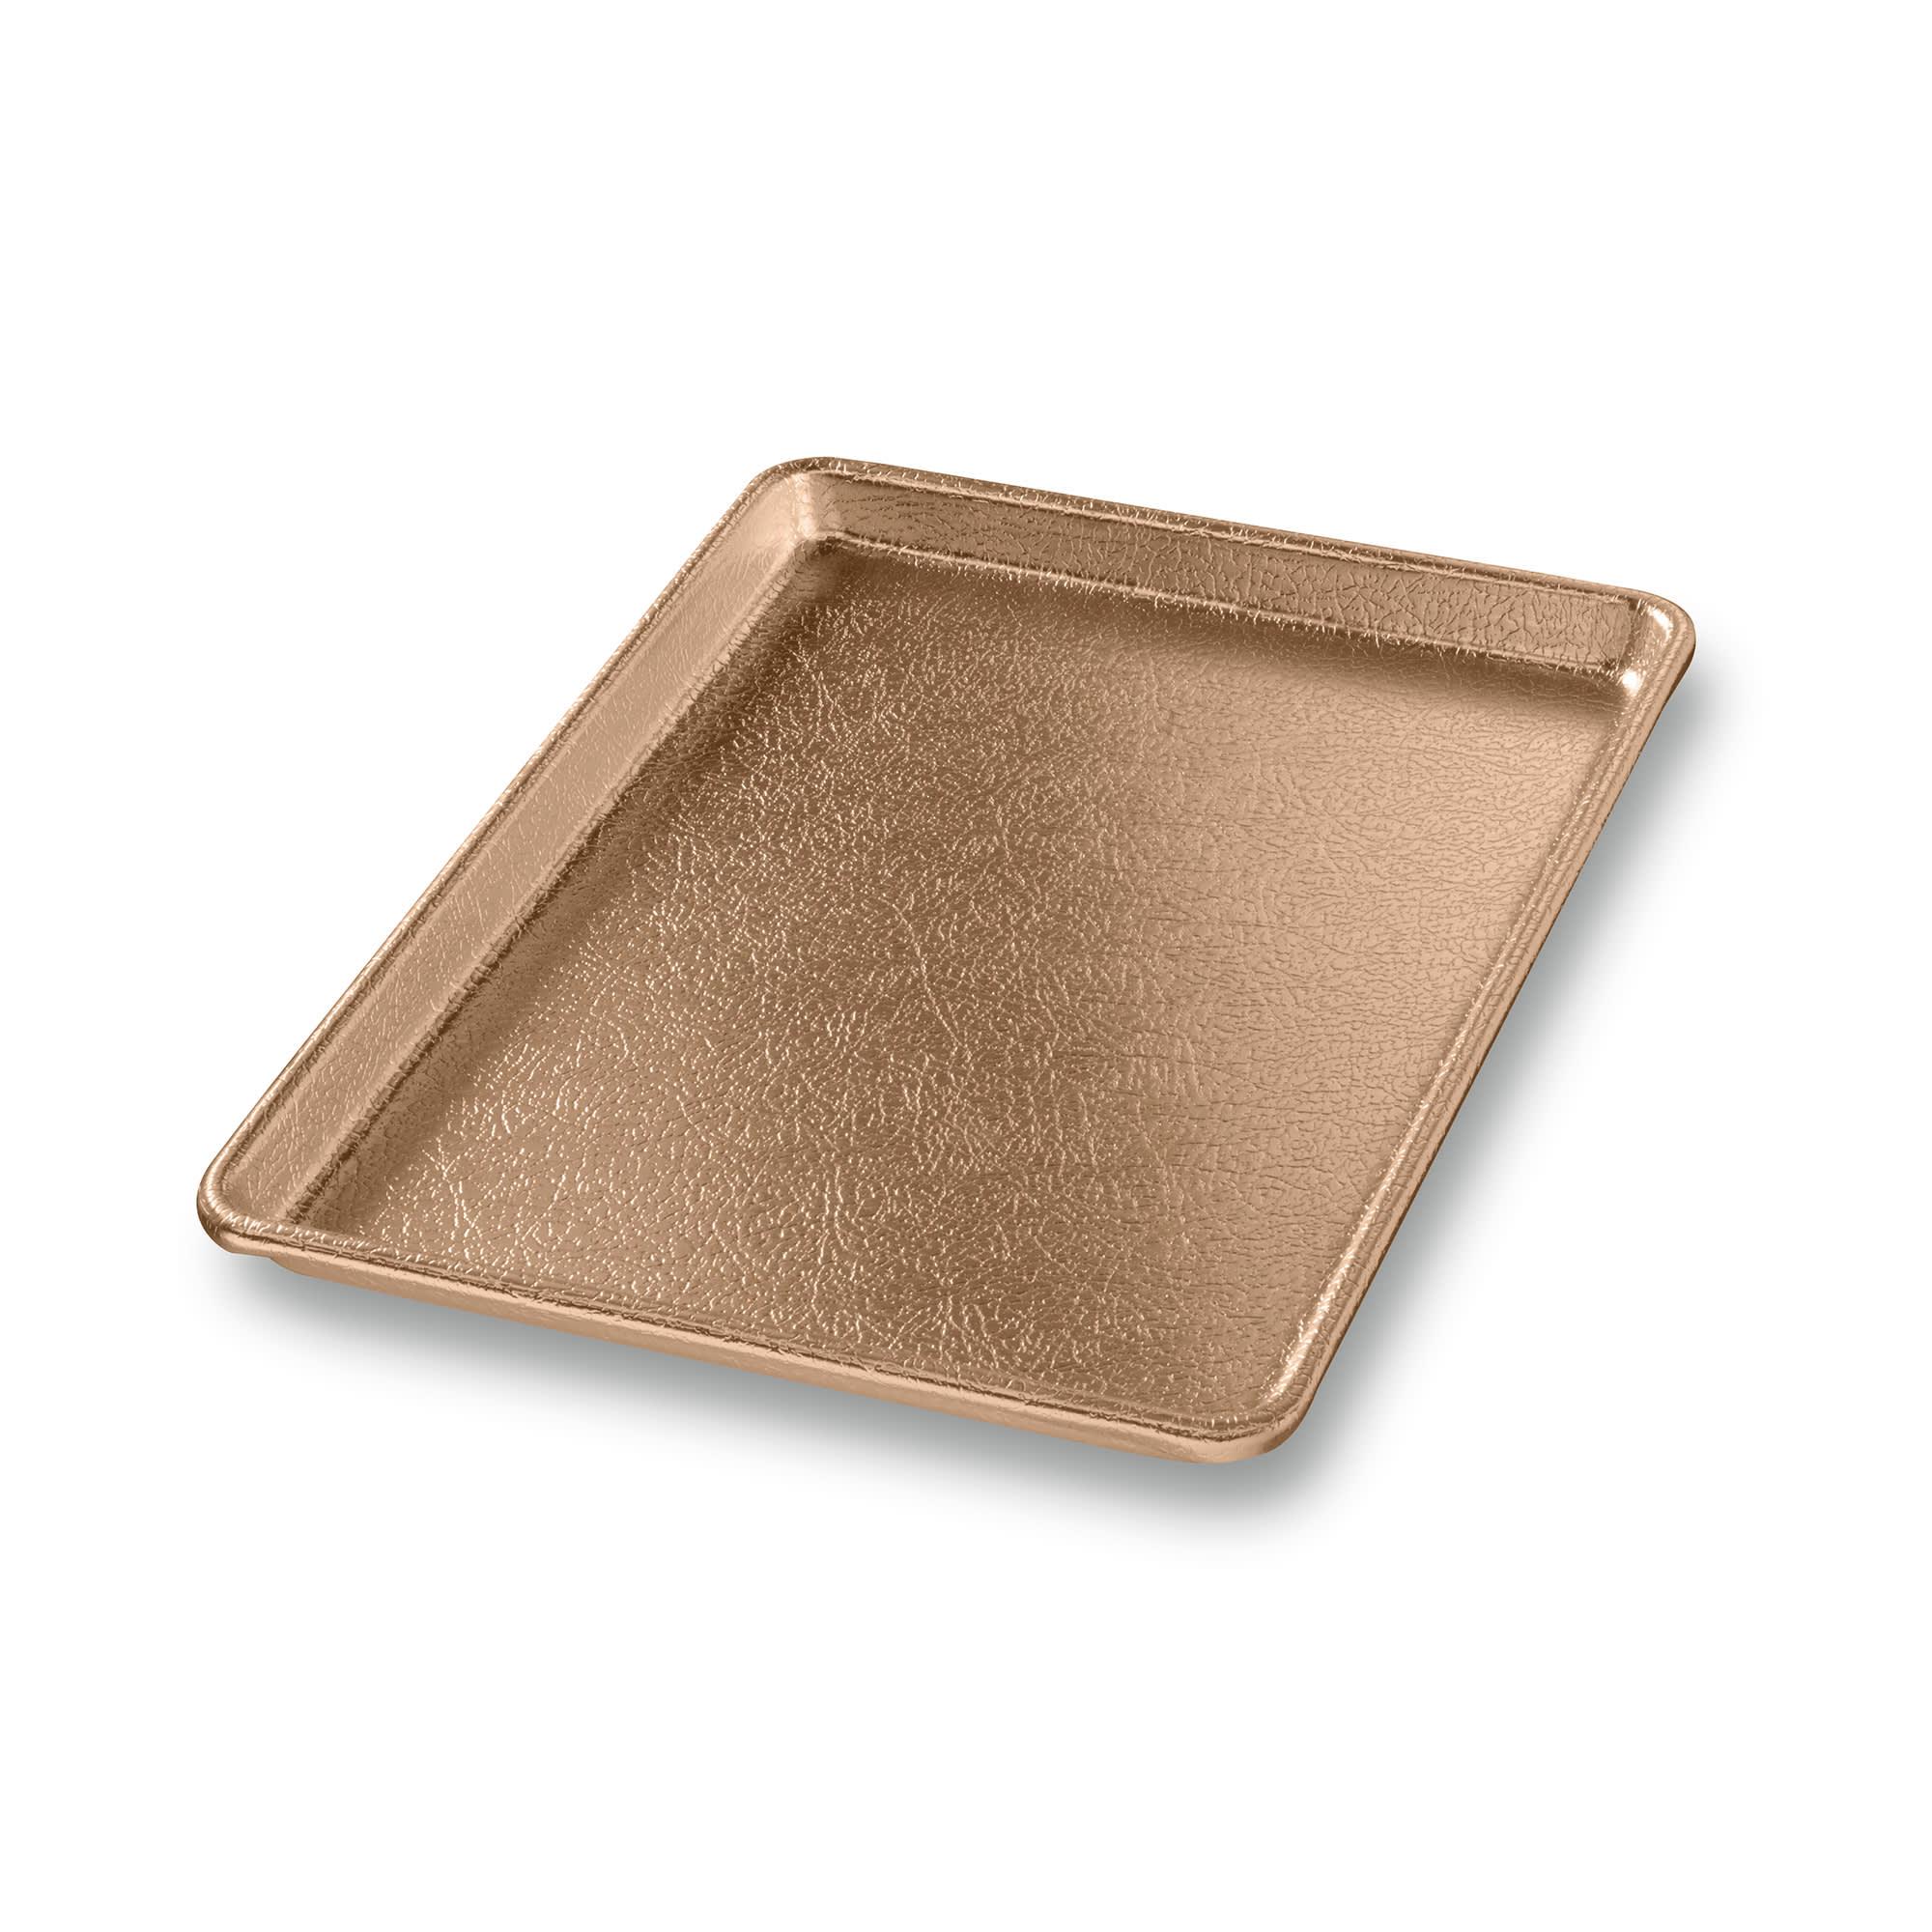 "Chicago Metallic 40940 Display Pan, 9.44"" x 12.9"" x 0.8"", Gold Finish, 16-ga. Anodized Aluminum"